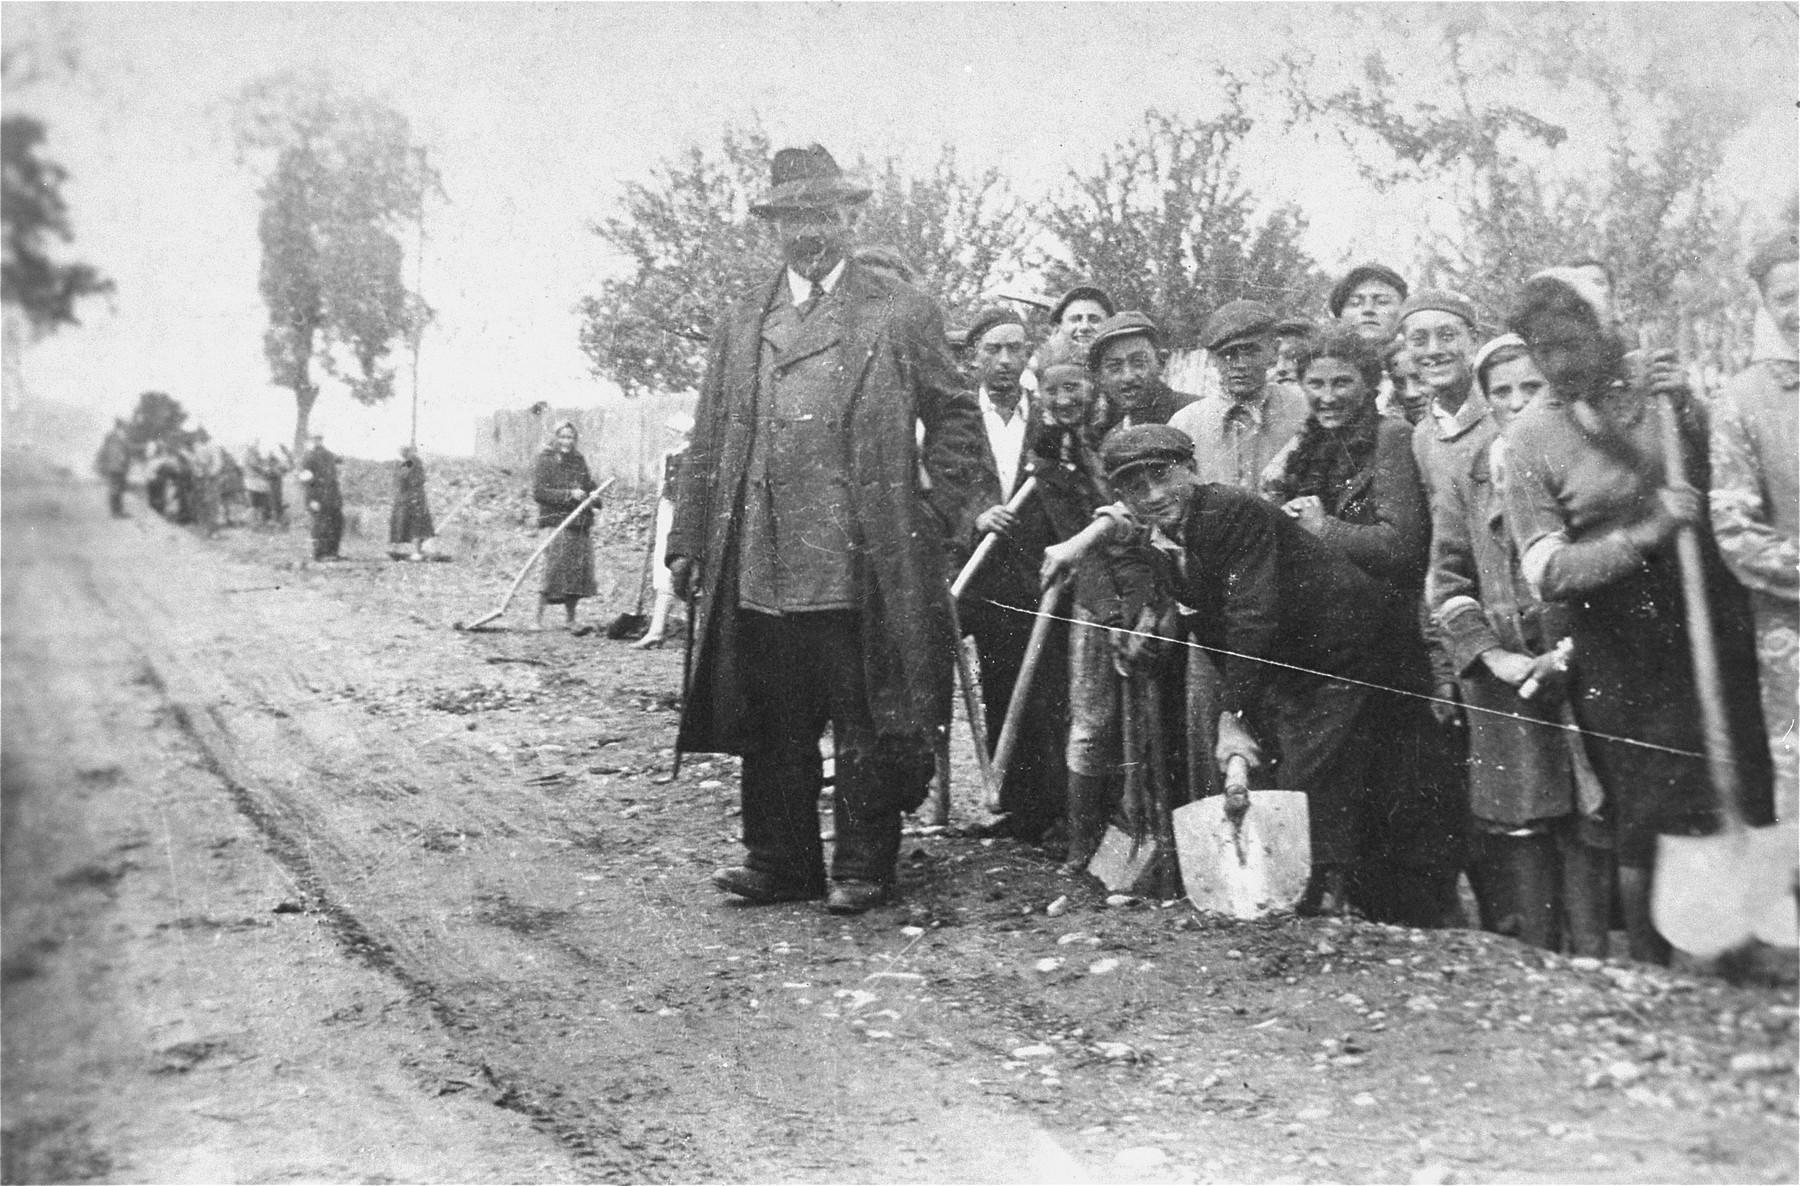 Polish Jews at forced labor in the Kolbuszowa ghetto.